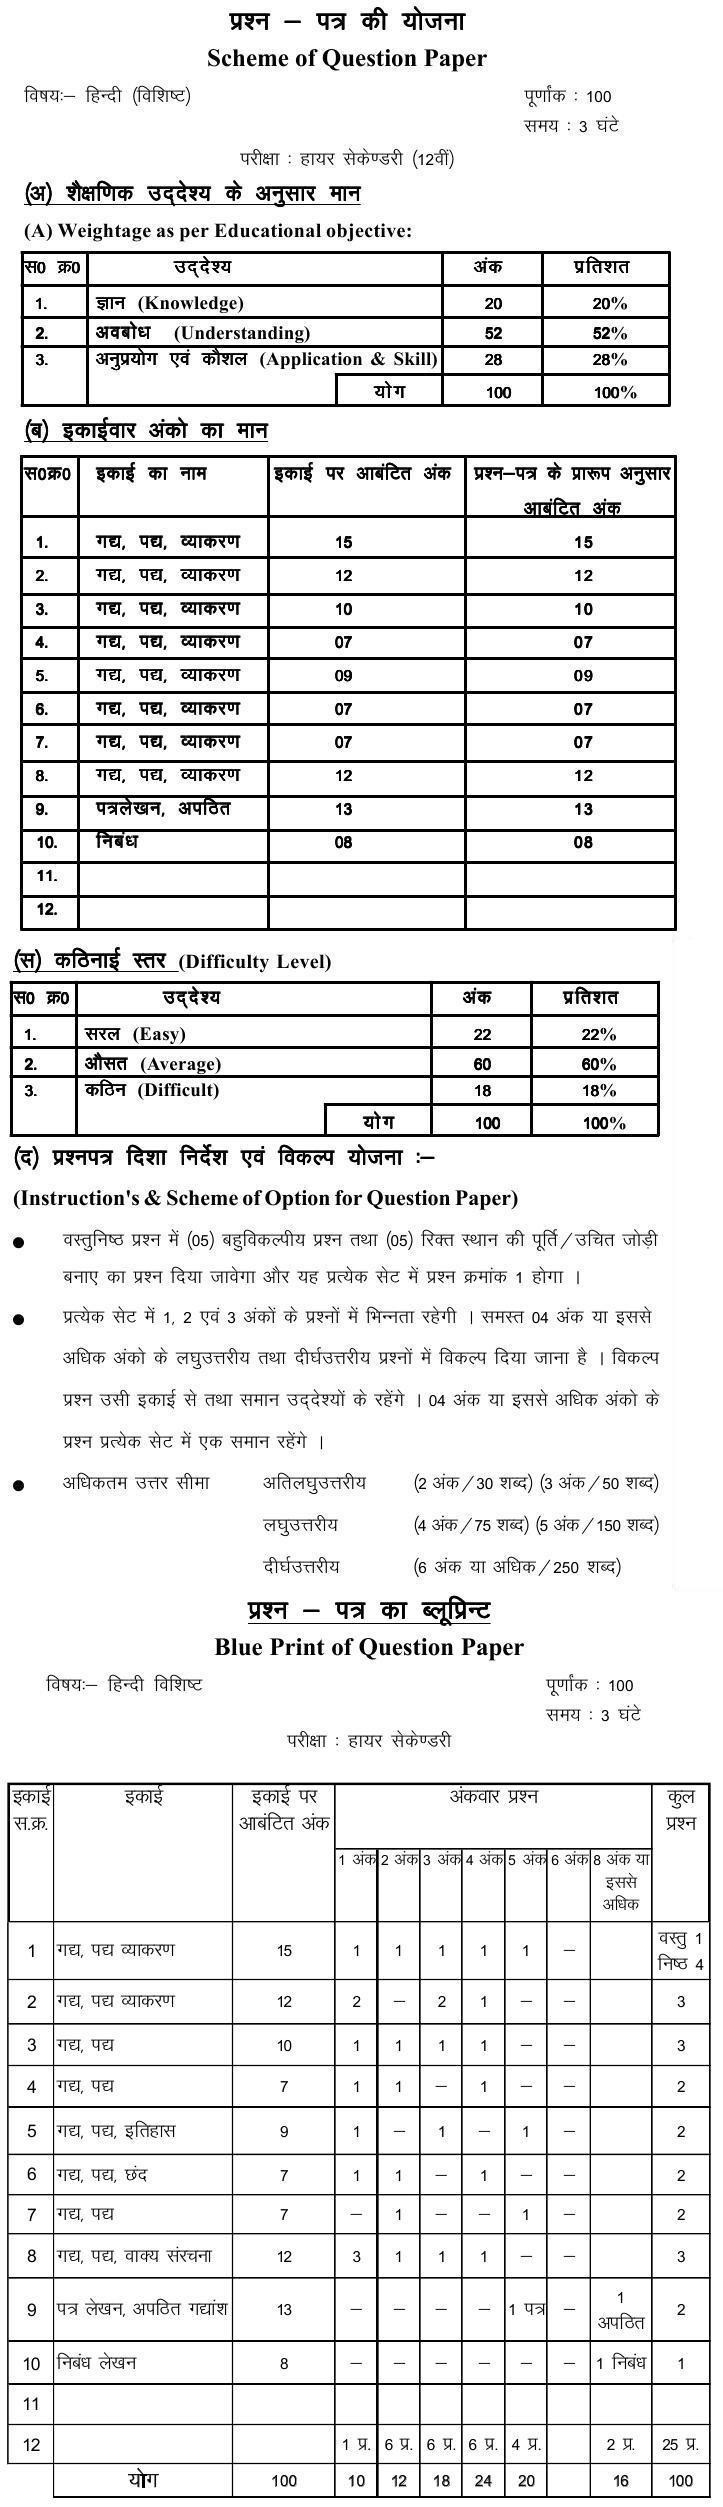 Chattisgarh Board Class 12 Scheme and Blue Print of Hindi Special